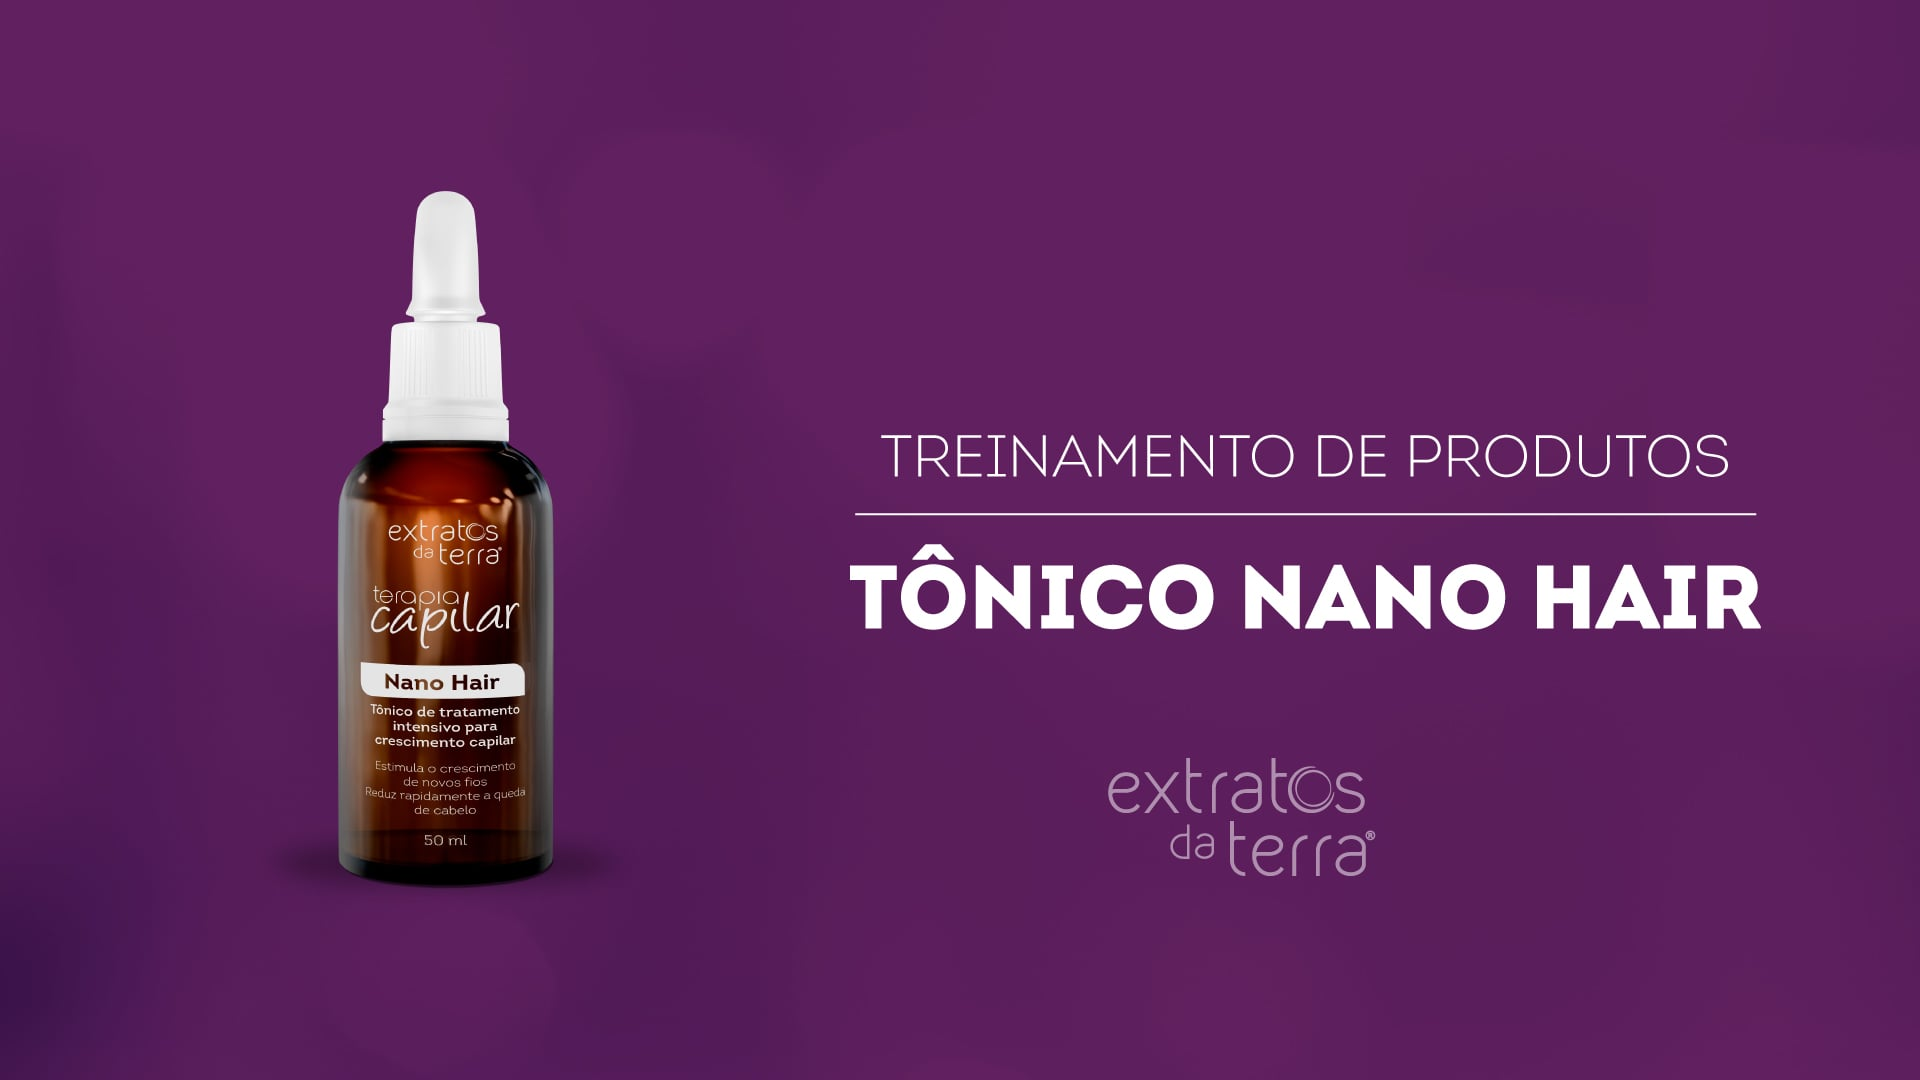 Conhecendo o Produto - Terapia Capilar Tônico Nano Hair